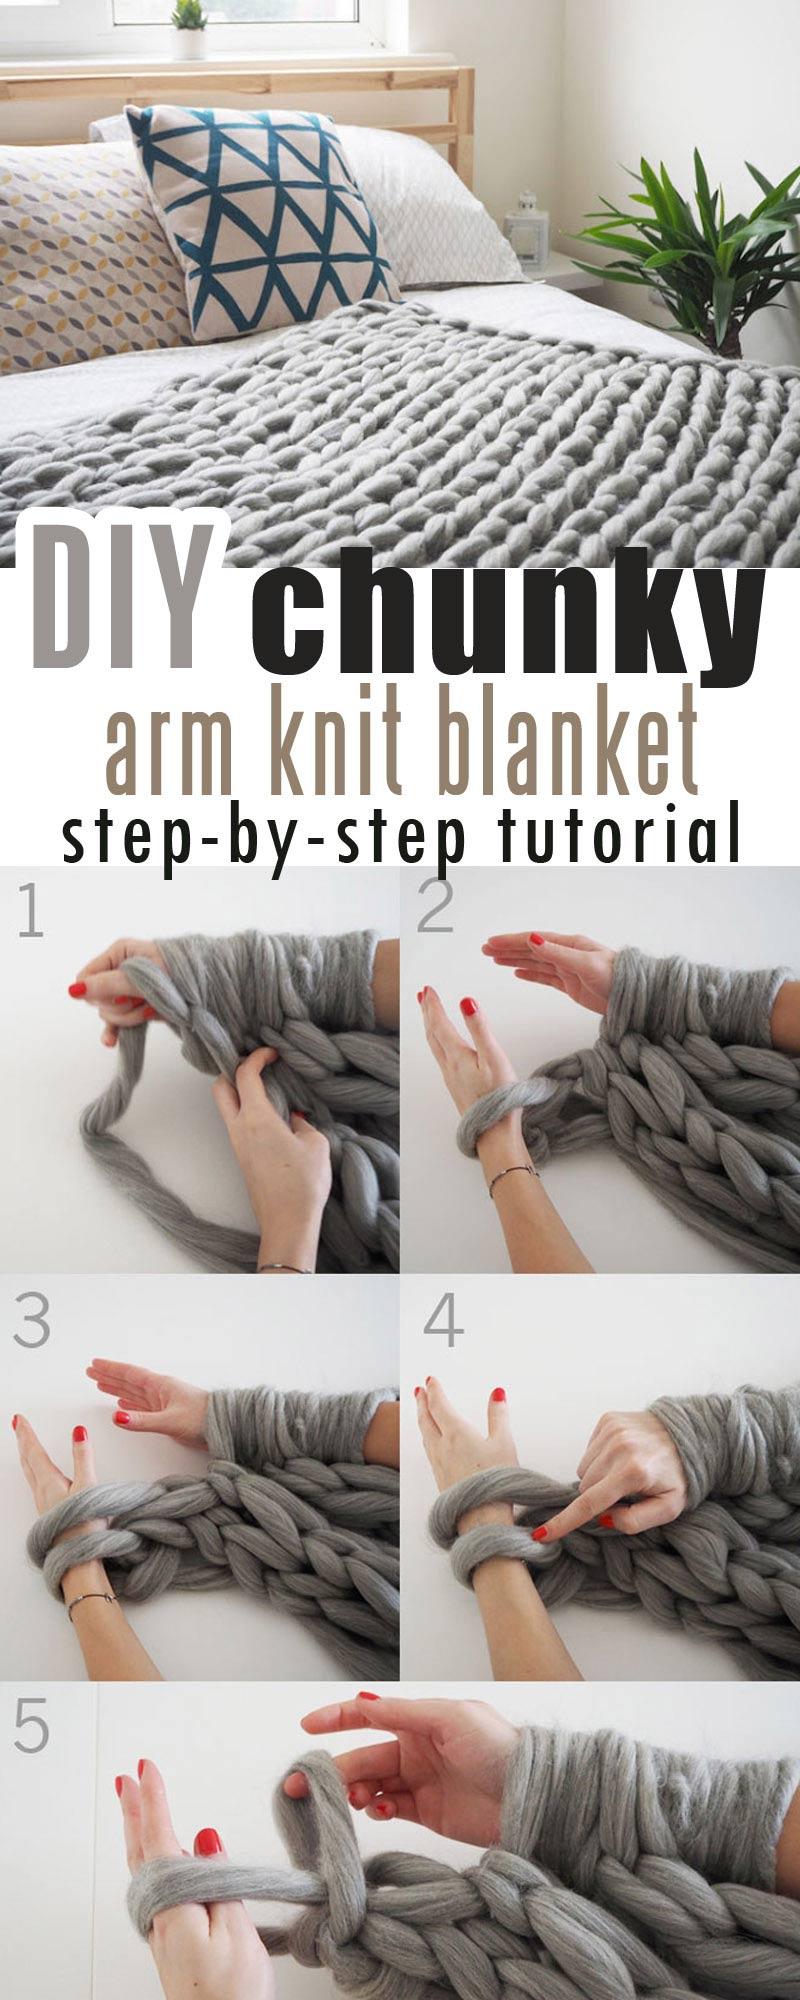 Giant kint arm blanket step by step tutorial #chunkyyarn #giantarmknit #diychunkyblanket #chunkyblanket #chunkythrow #chunkyyarn #chunkyyarnforarmknitting